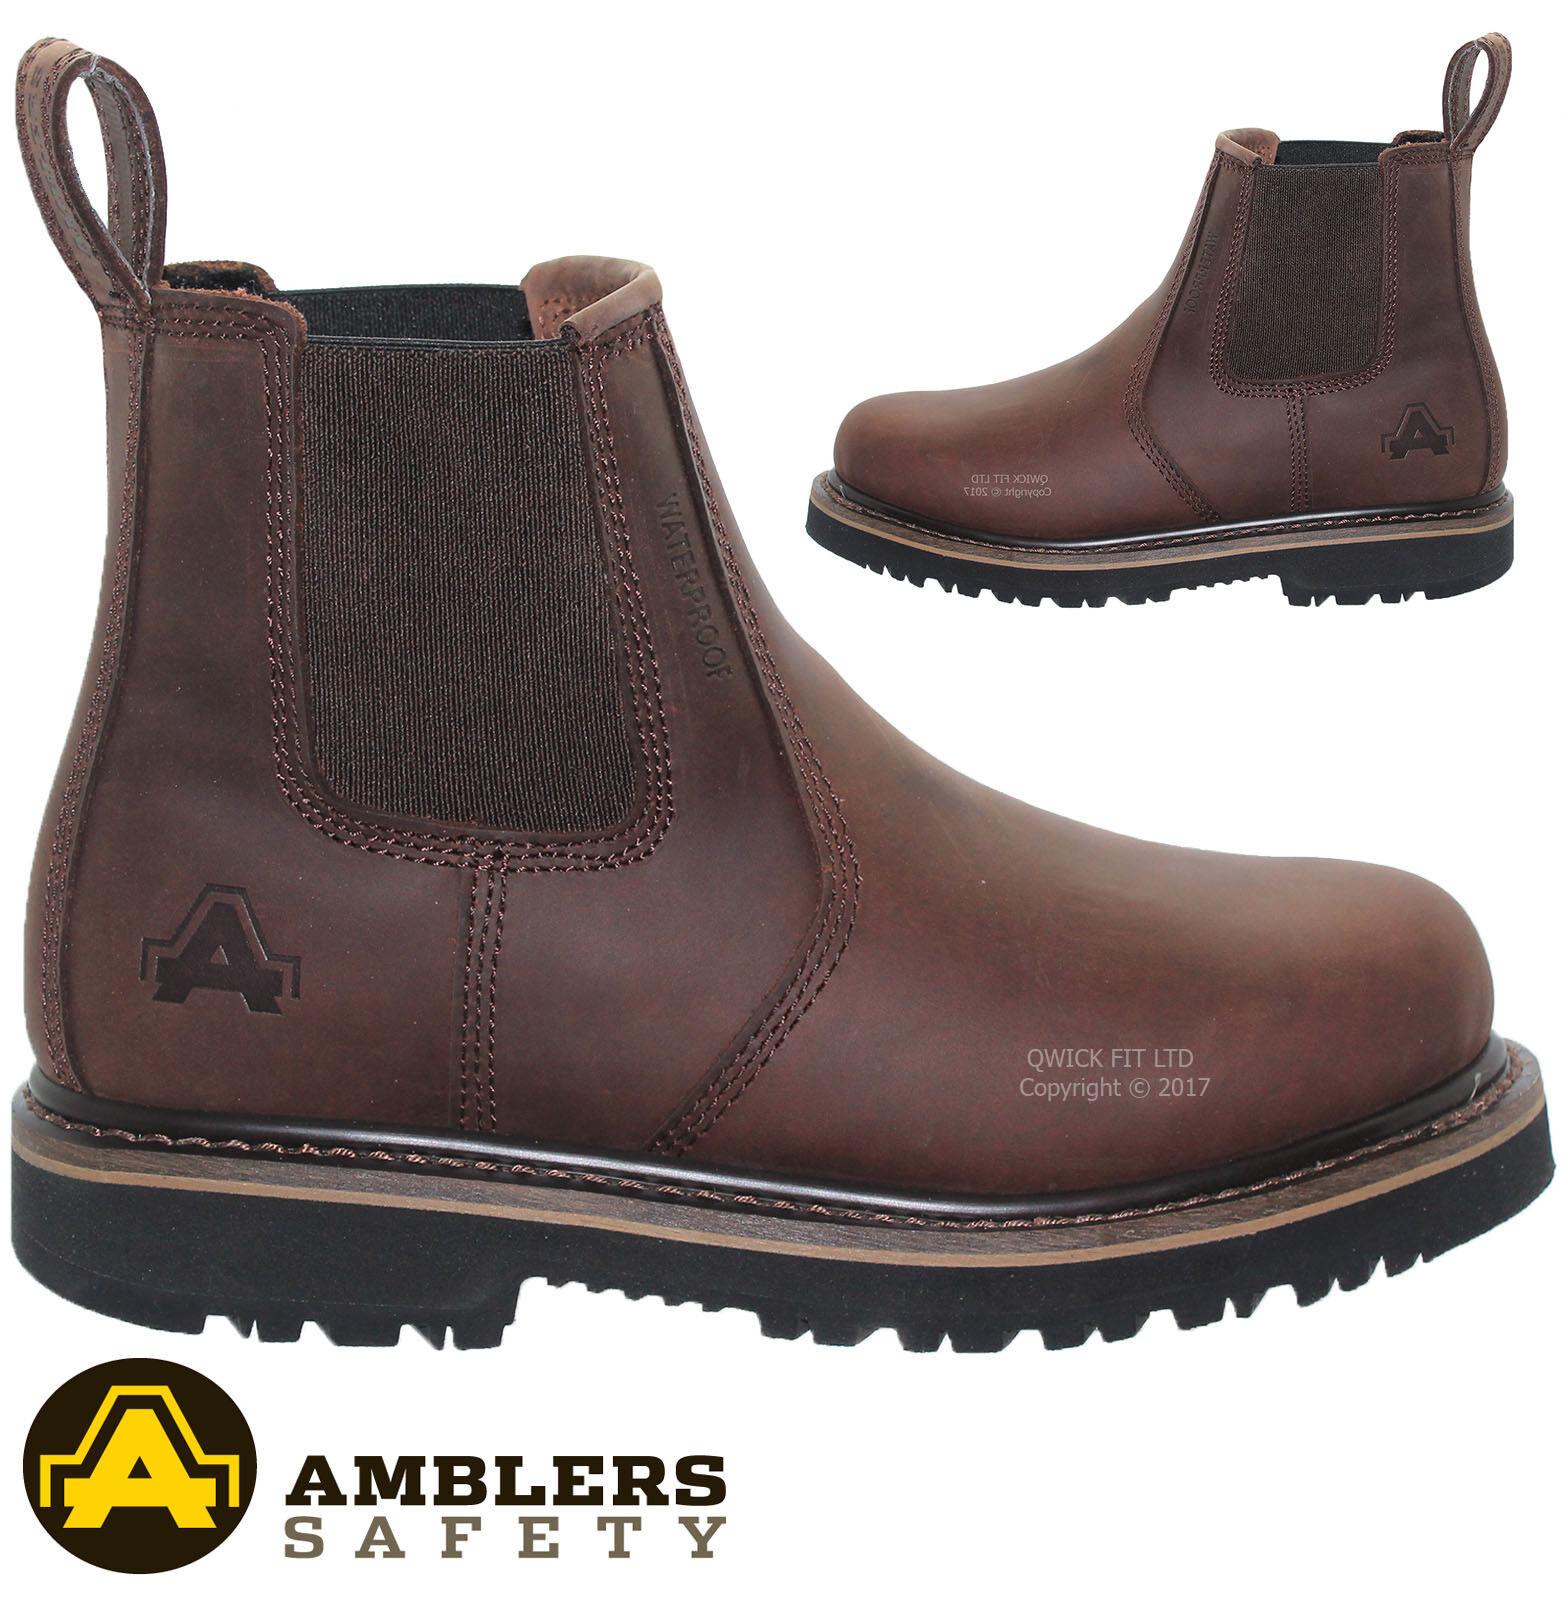 NEW MENS AMBLER WATERPROOF SAFETY WORK STEEL TOE CAP DEALER SHOES CHELSEA BOOTS